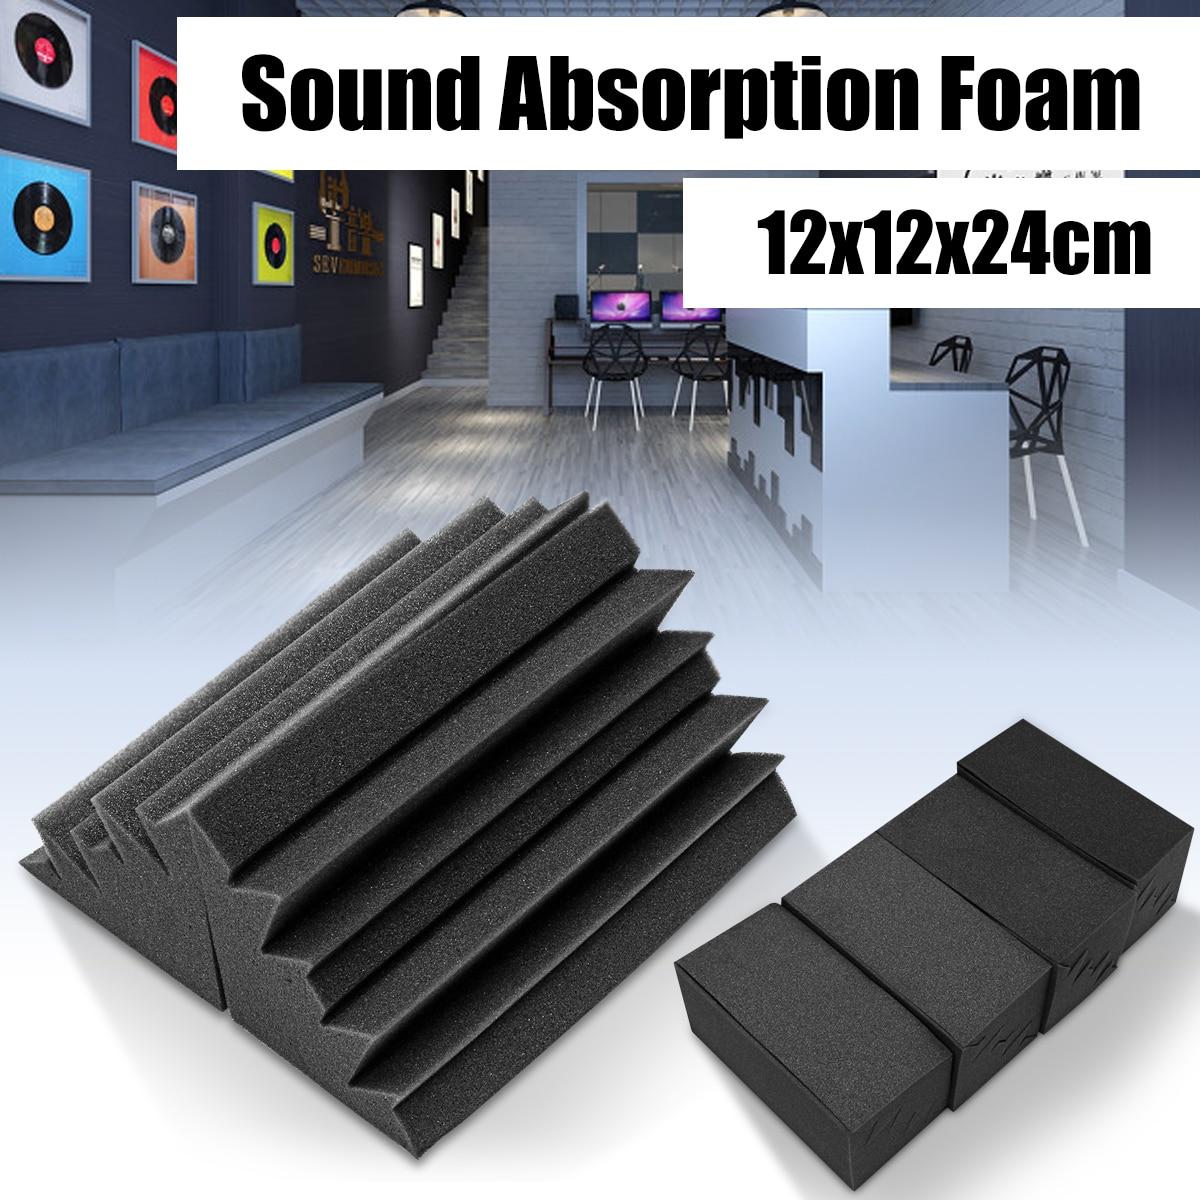 8Pcs 12x11x24cm Soundproofing Foam Acoustic Foam Noise Sound Treatment Studio Room Absorption Wedge Tiles Polyurethane foam sound absorption coefficient analysis